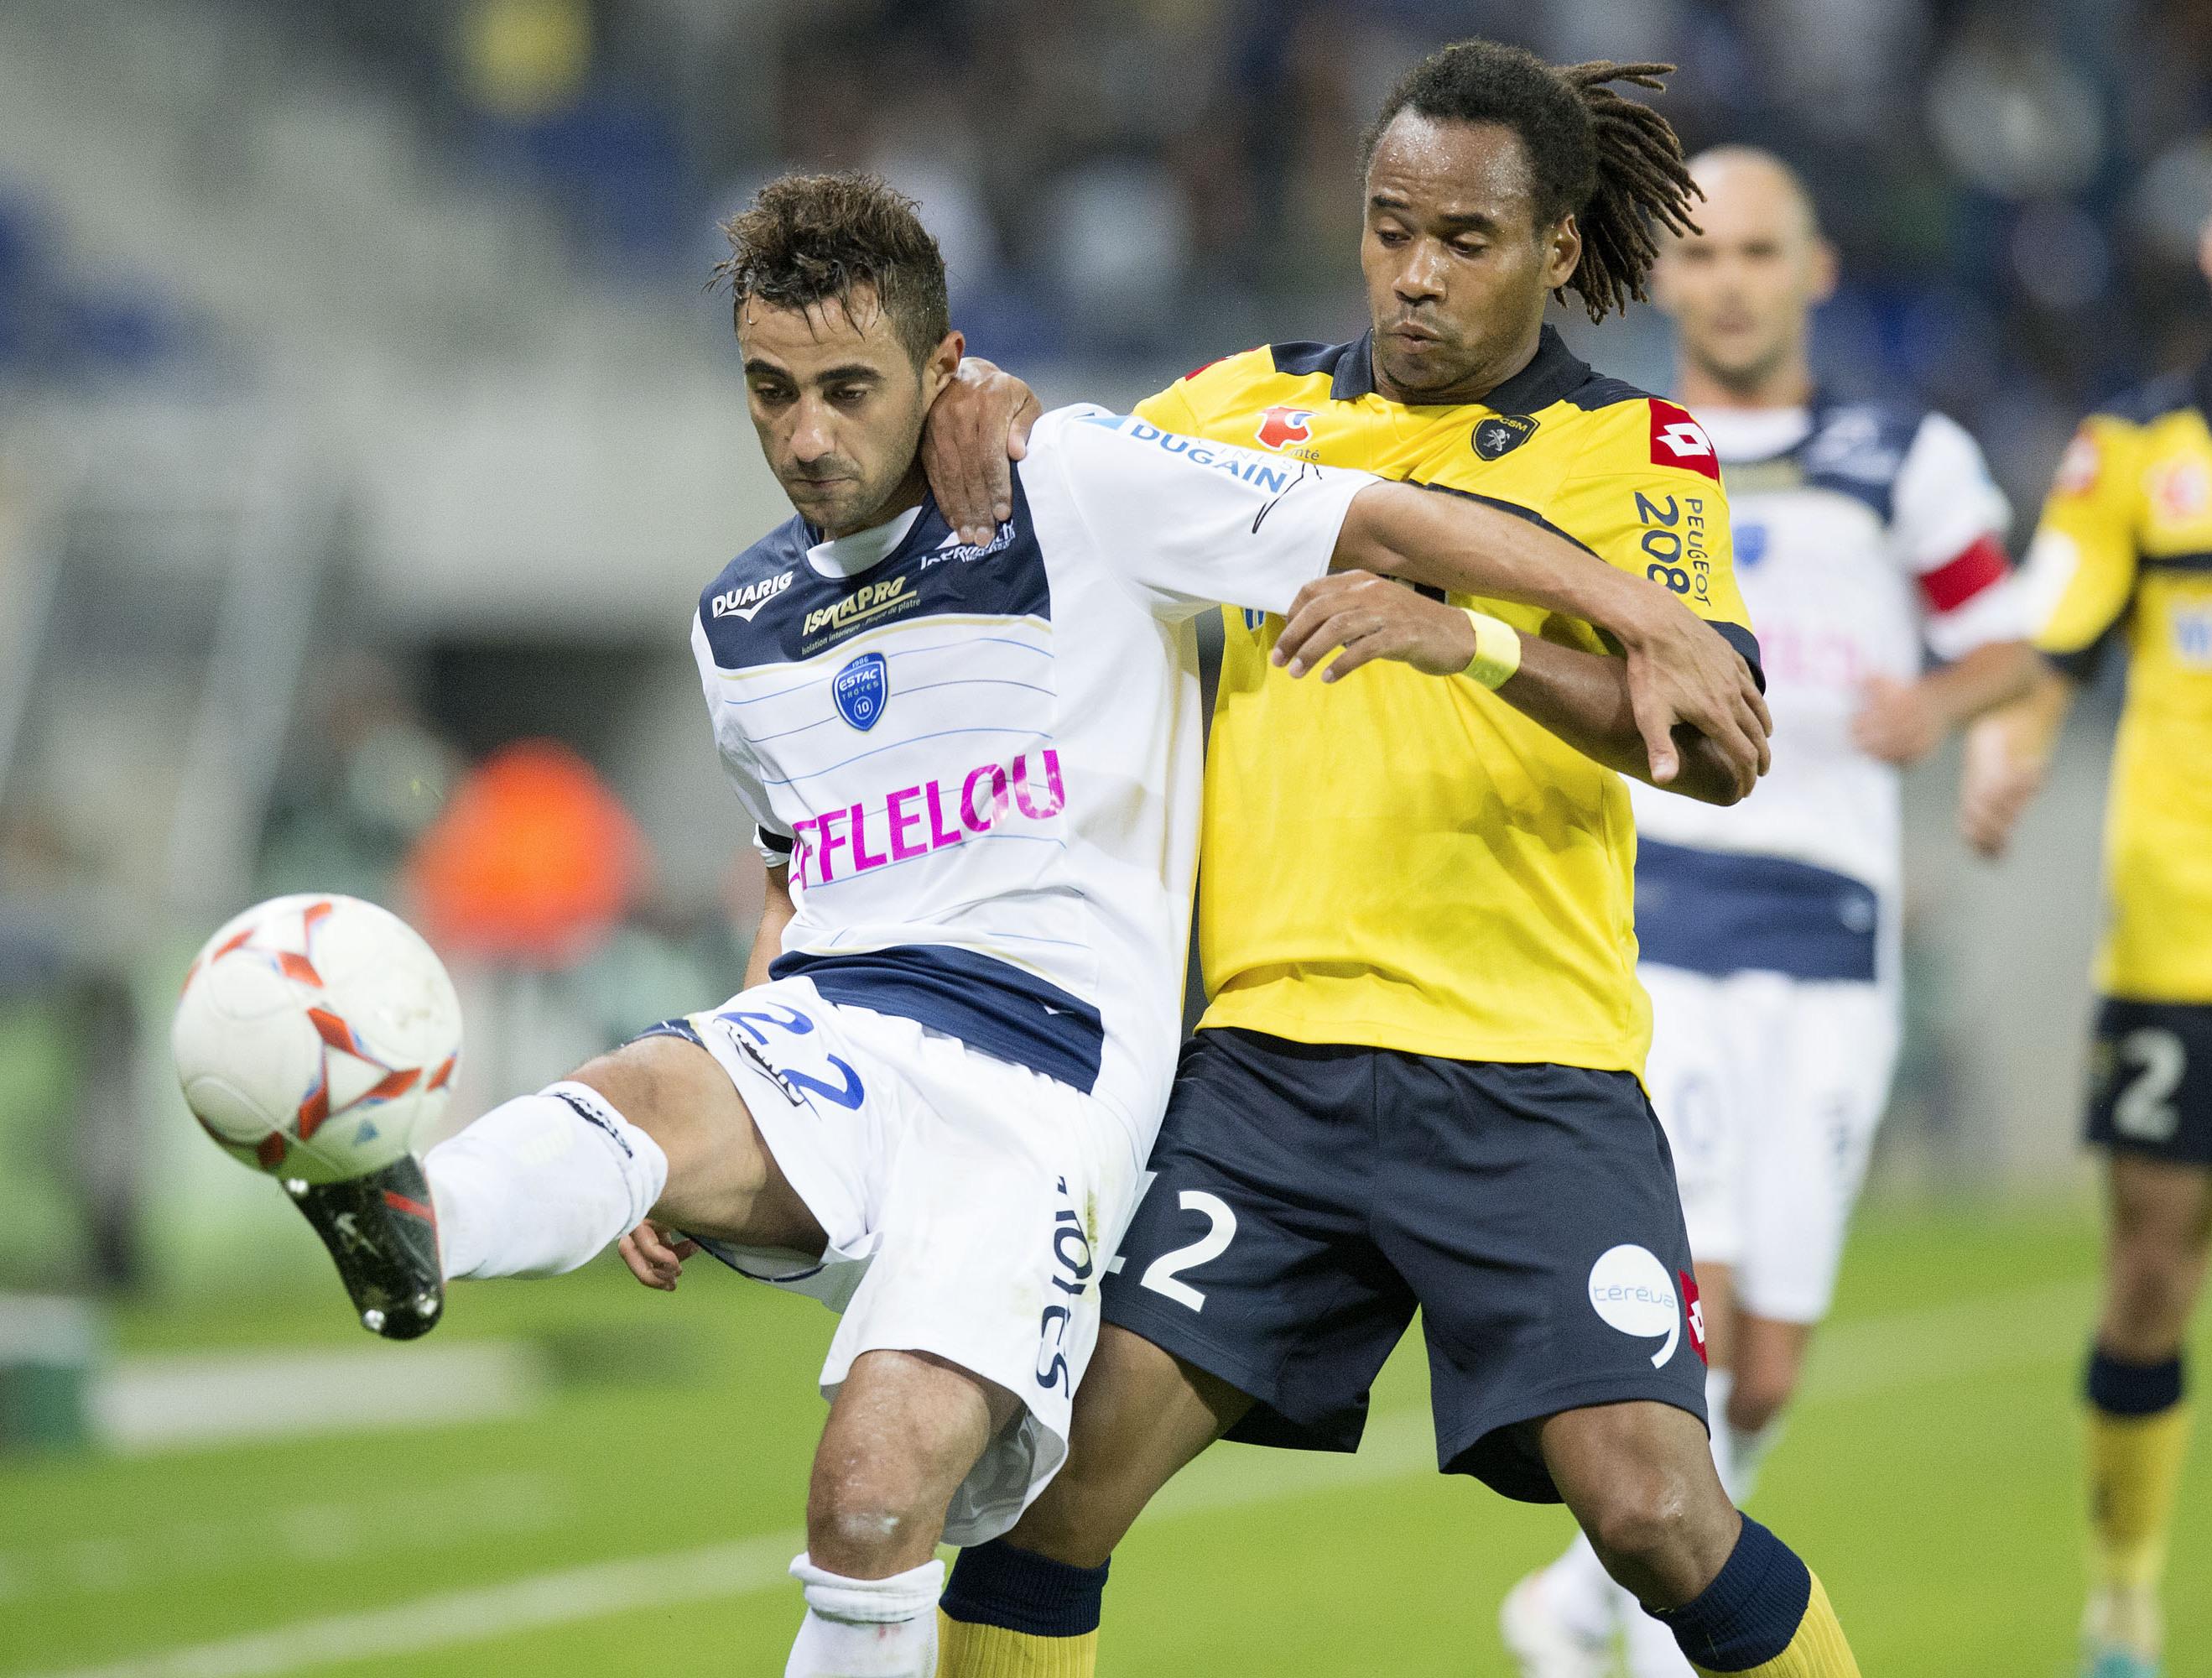 Ligue 2 match fc sochaux vs estac troyes en direct for Match estac